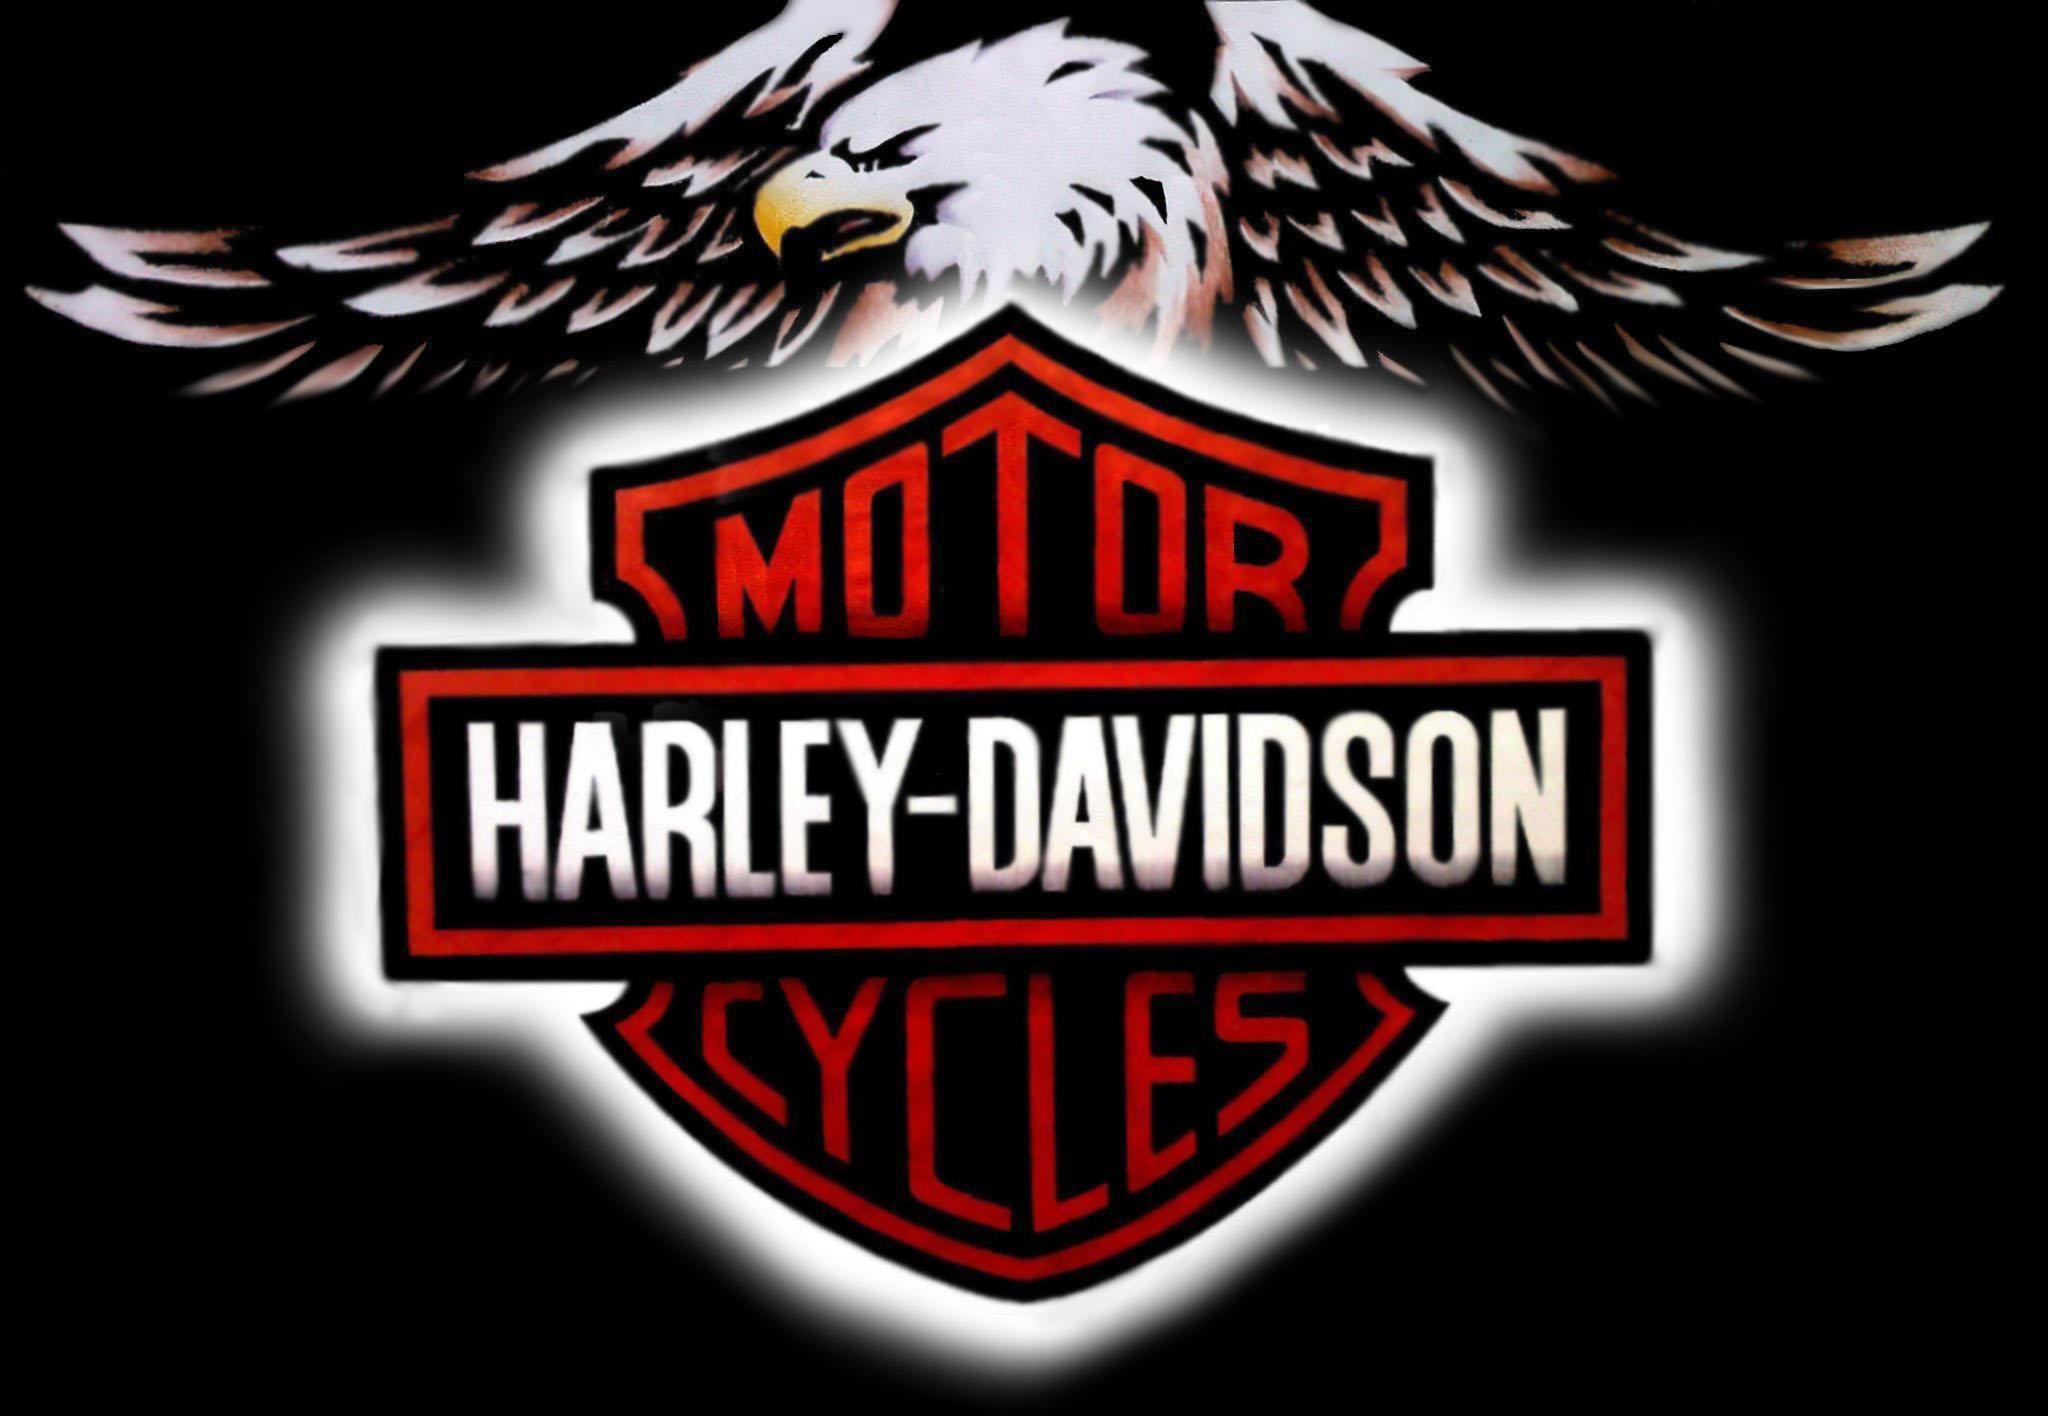 harley davidson background wallpaper Harley Davidson Wallpaper 2048x1416